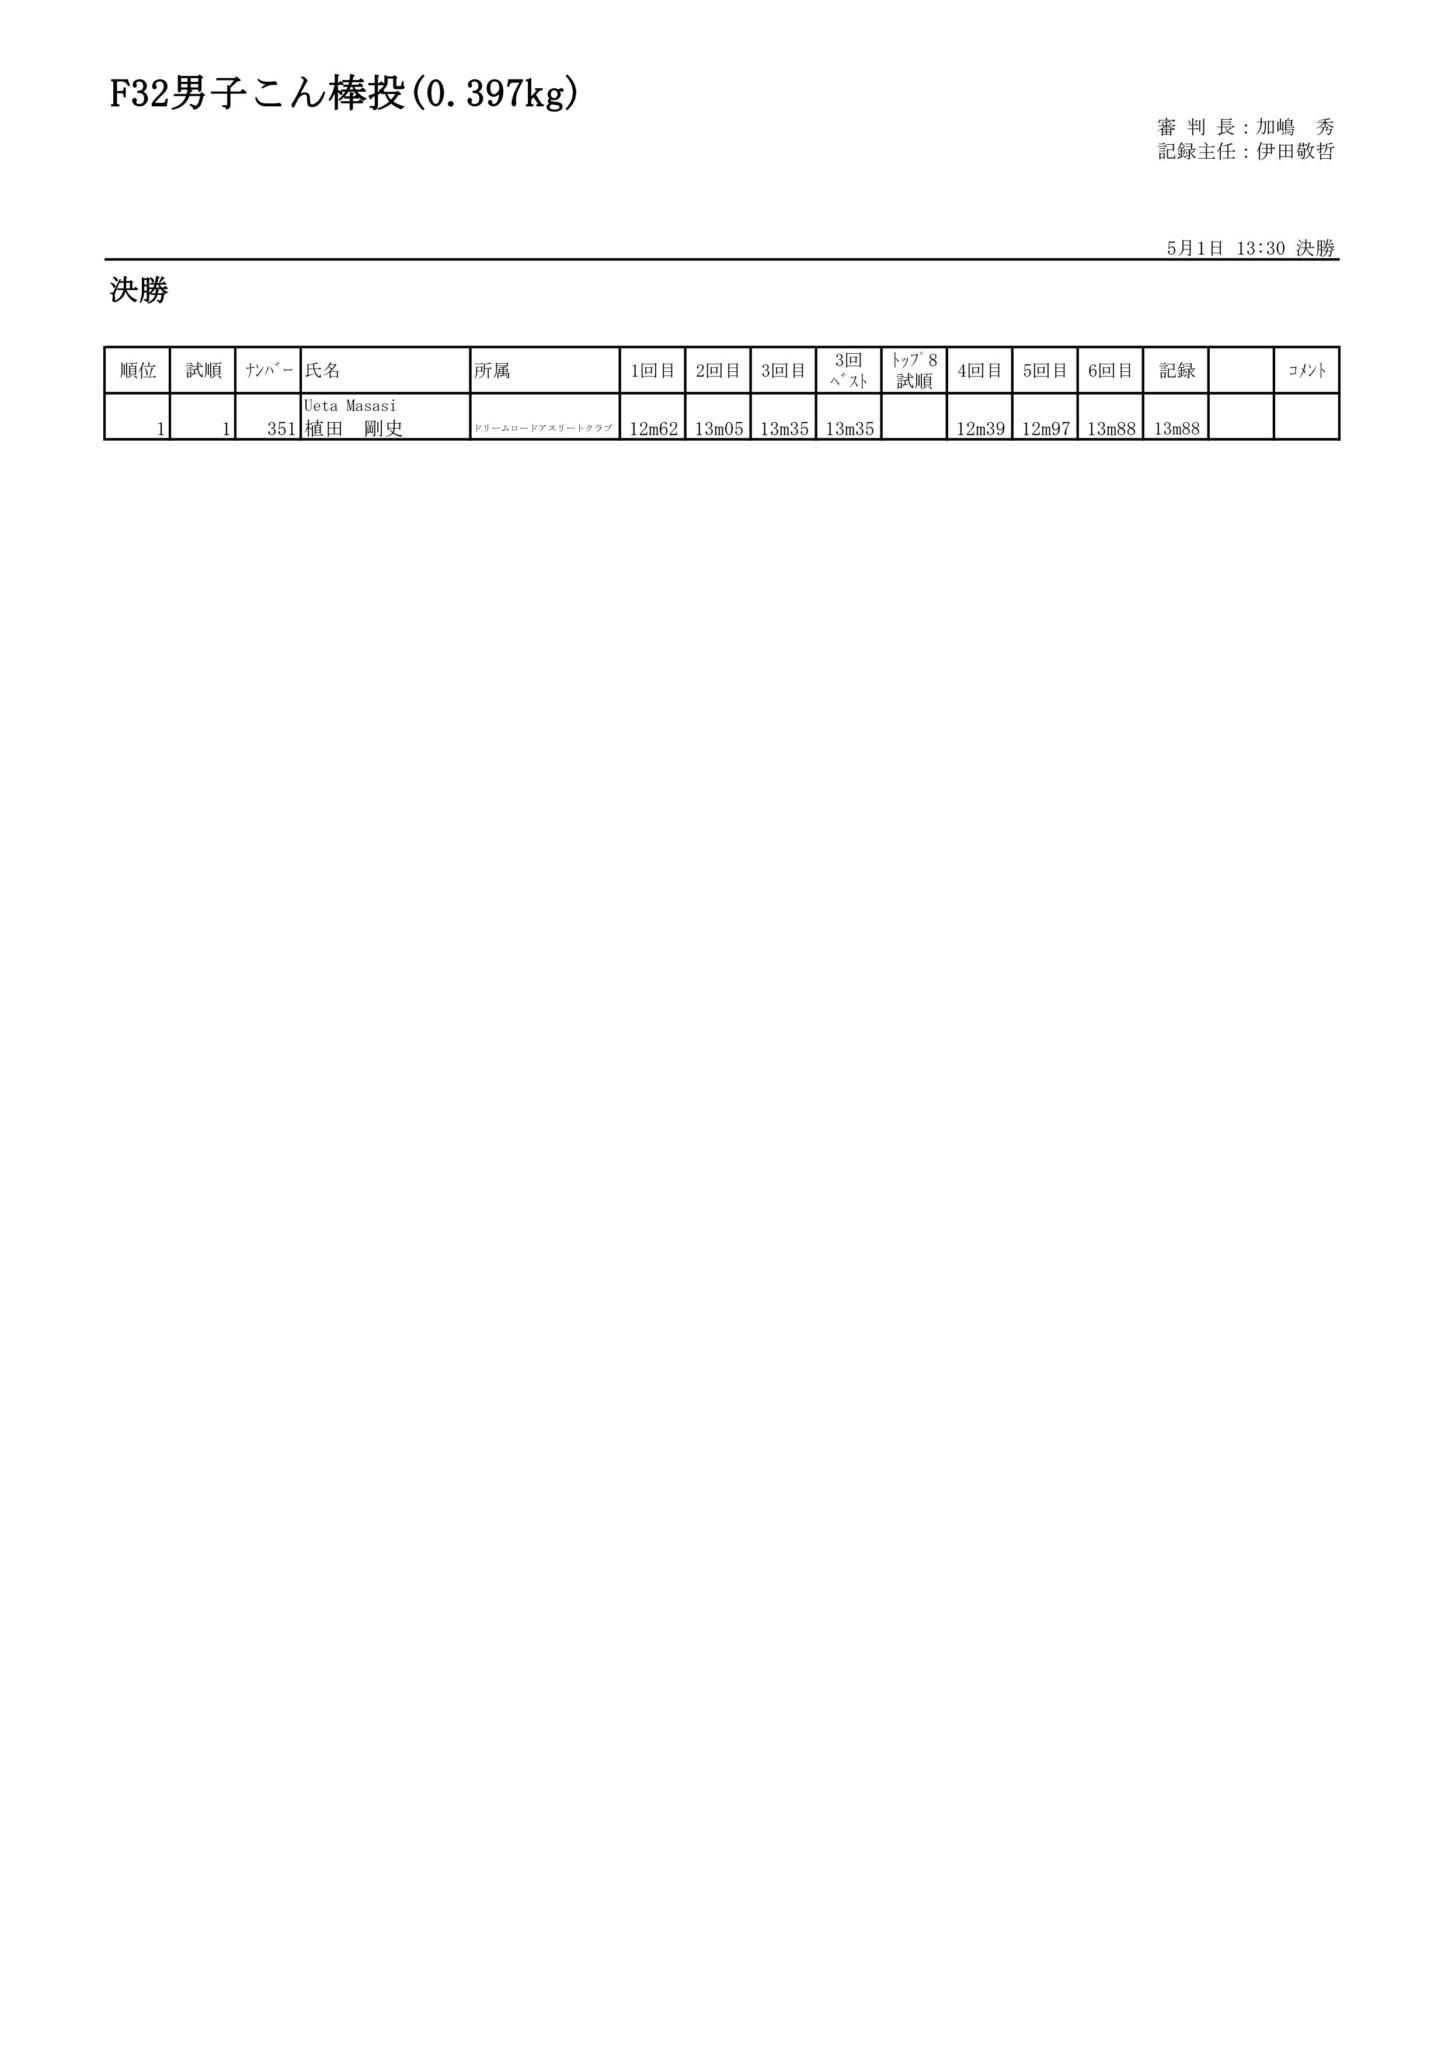 59F32男子こん棒投(0.397kg)_01